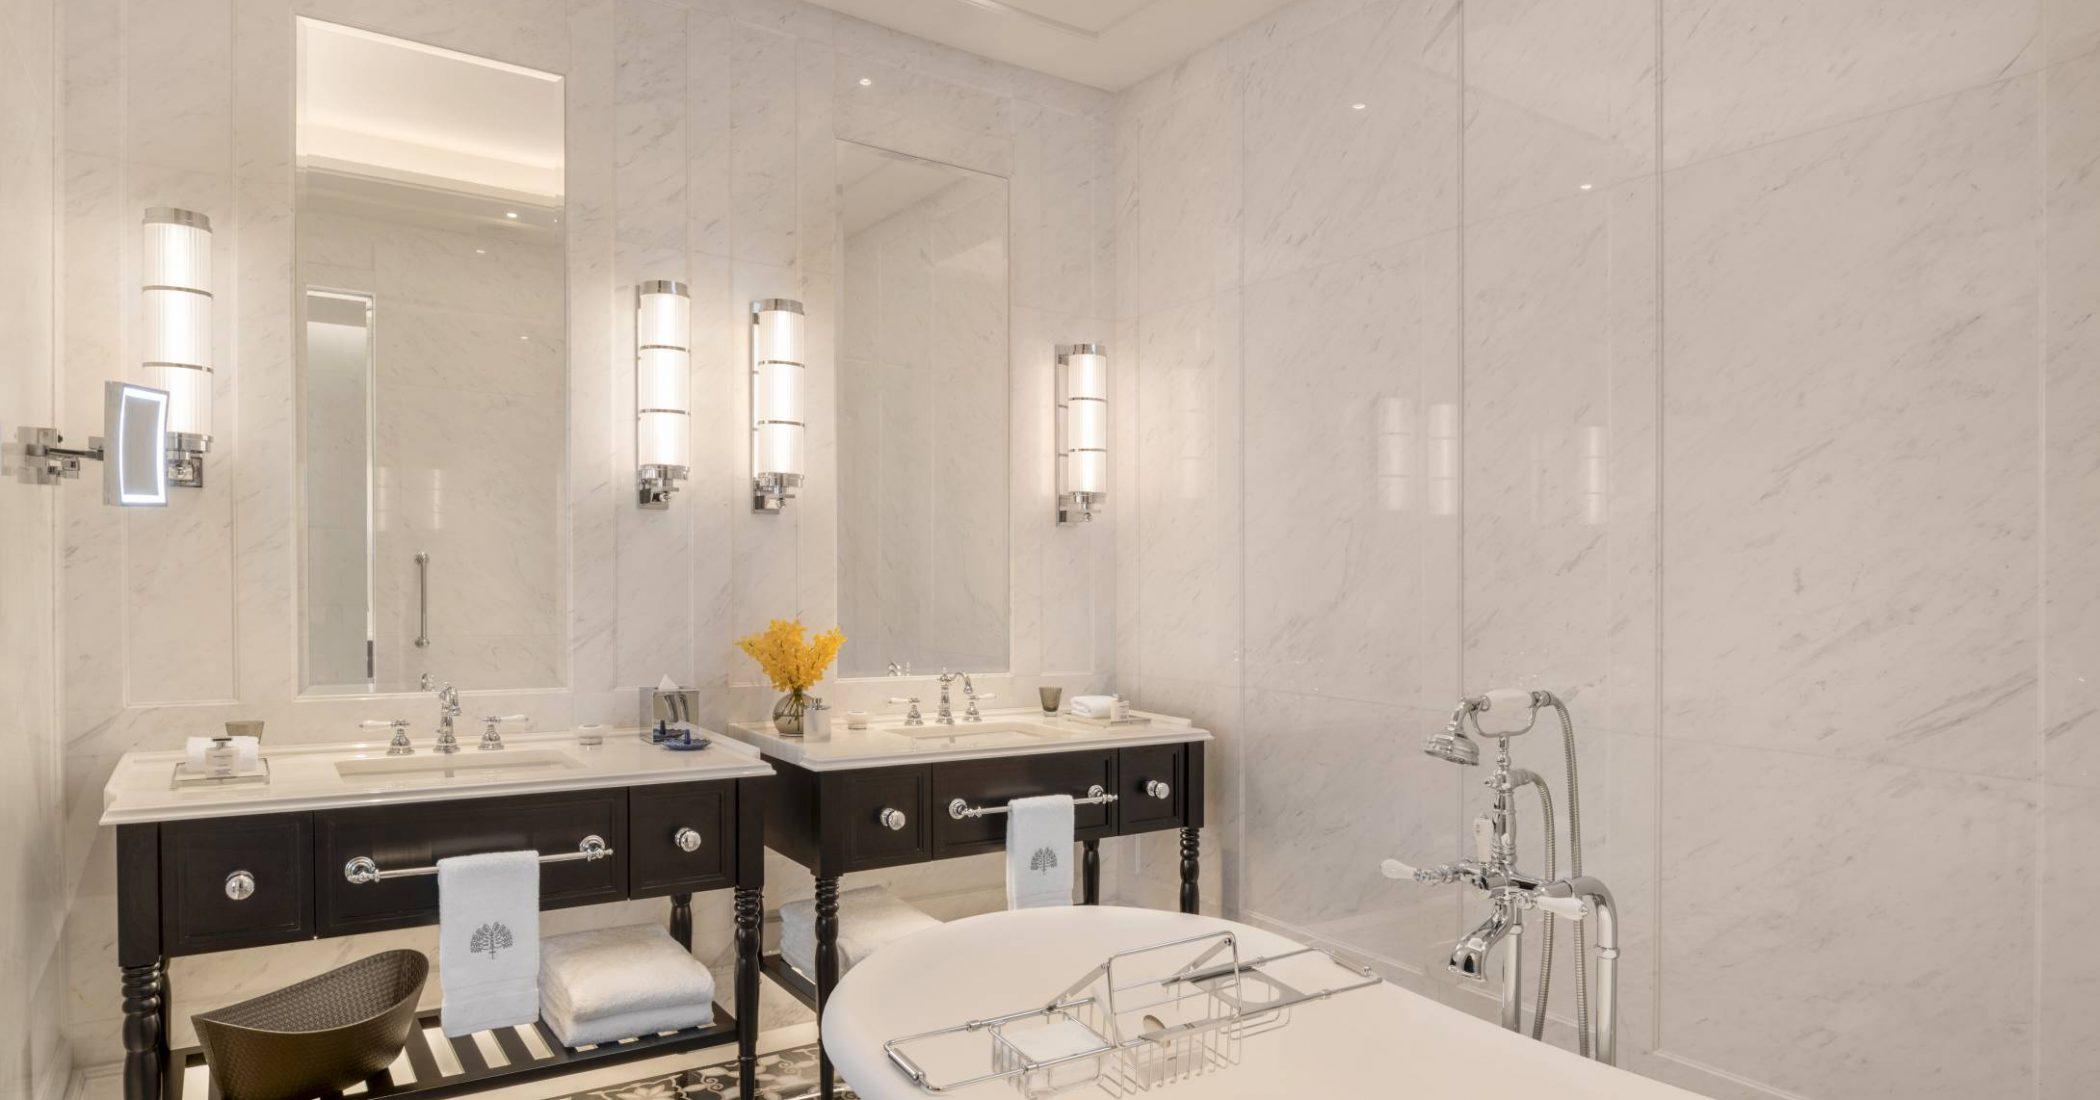 Raffles Singapore - Courtyard Suites